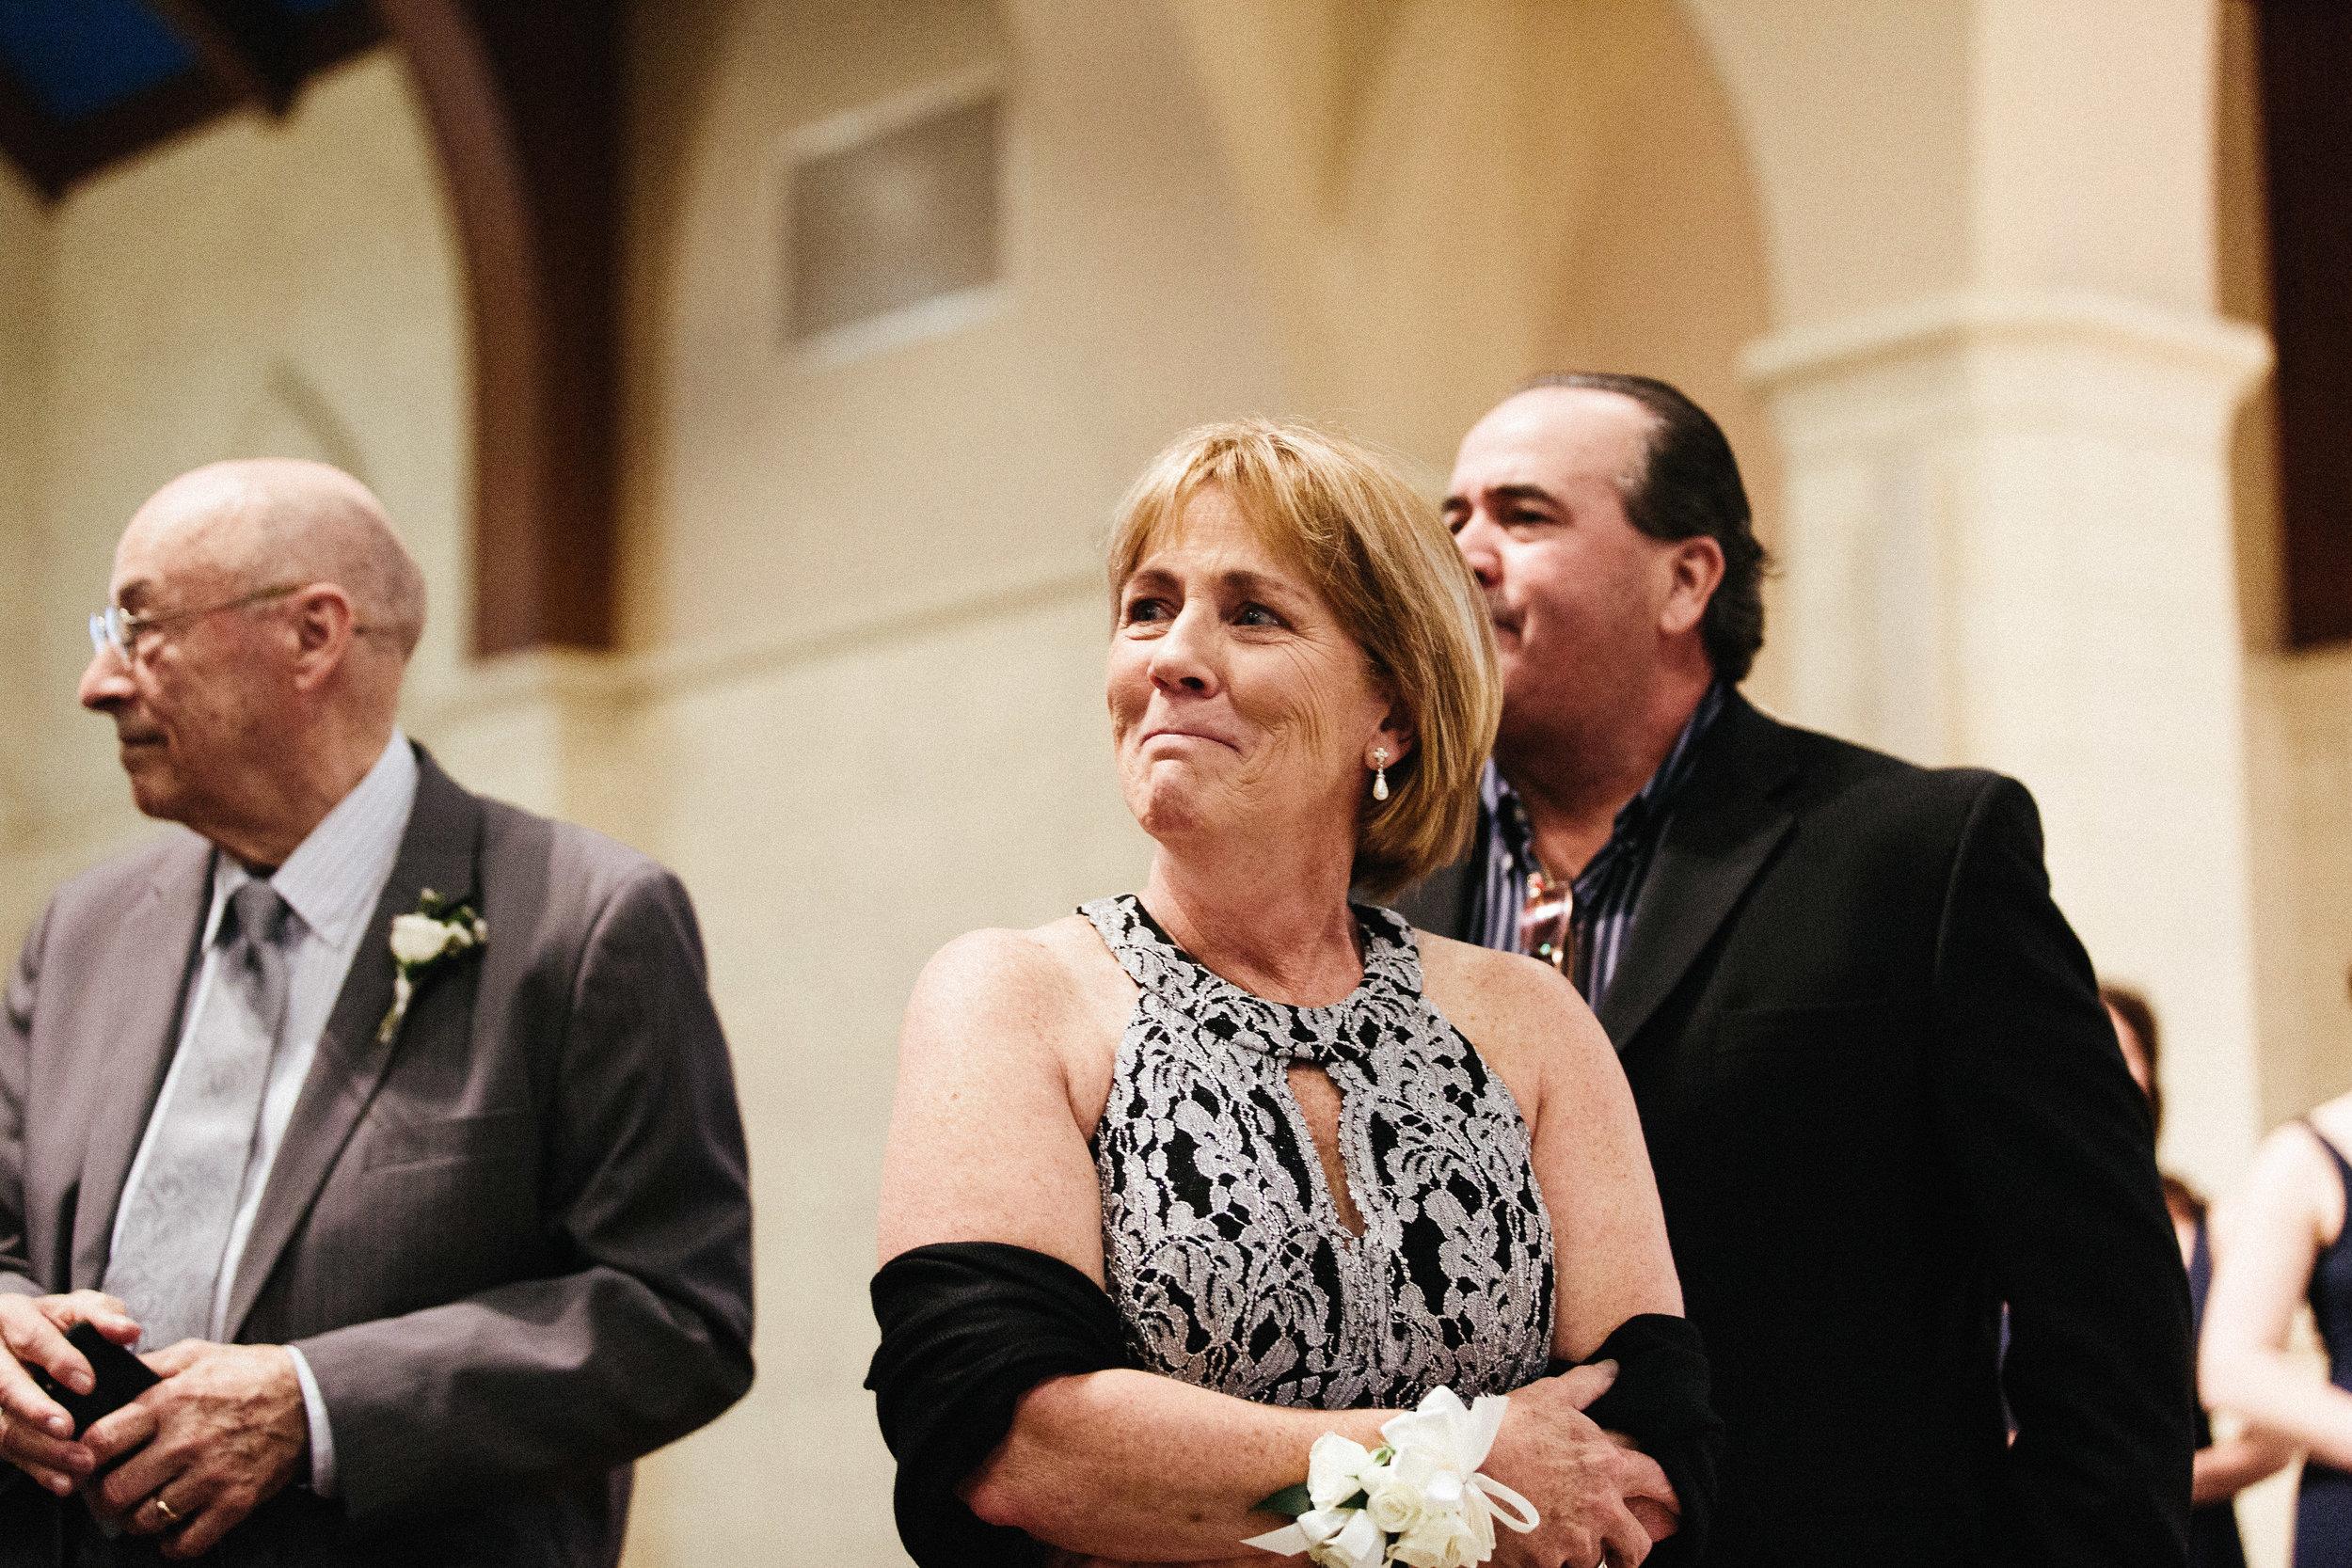 roswell_st_peter_chanel_catholic_avalon_hotel_alpharetta_wedding-1435.jpg